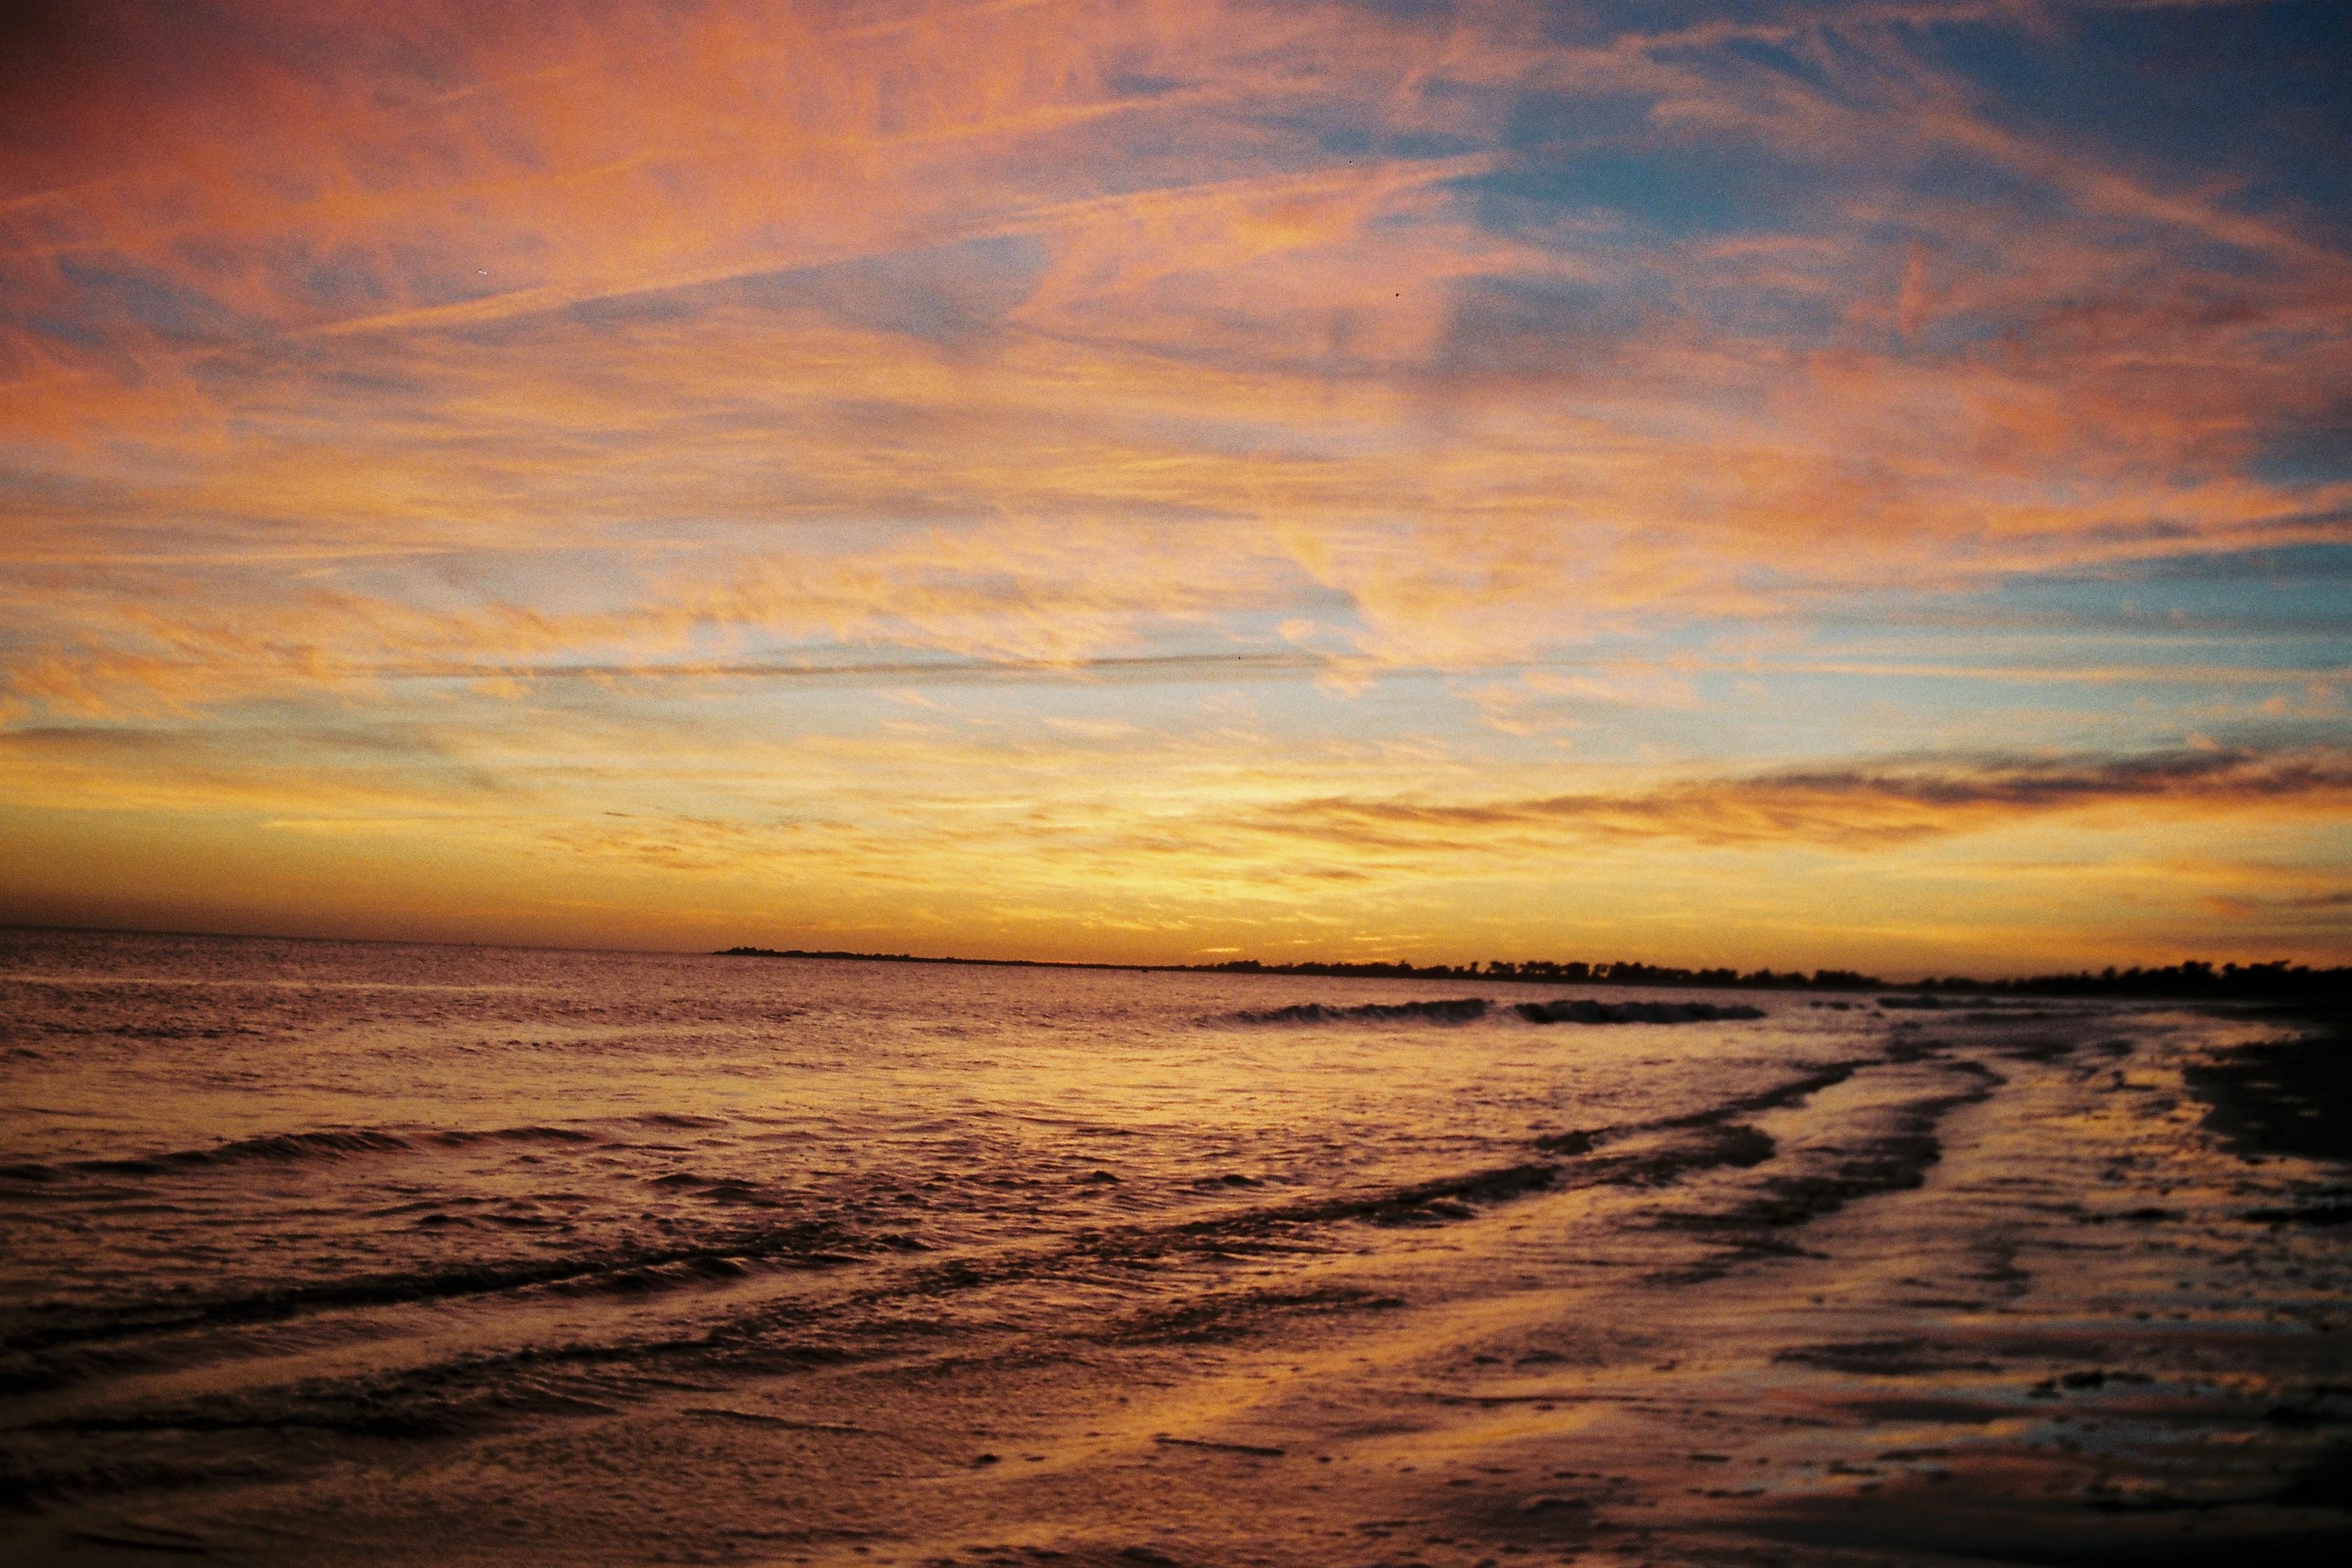 Sunset of island